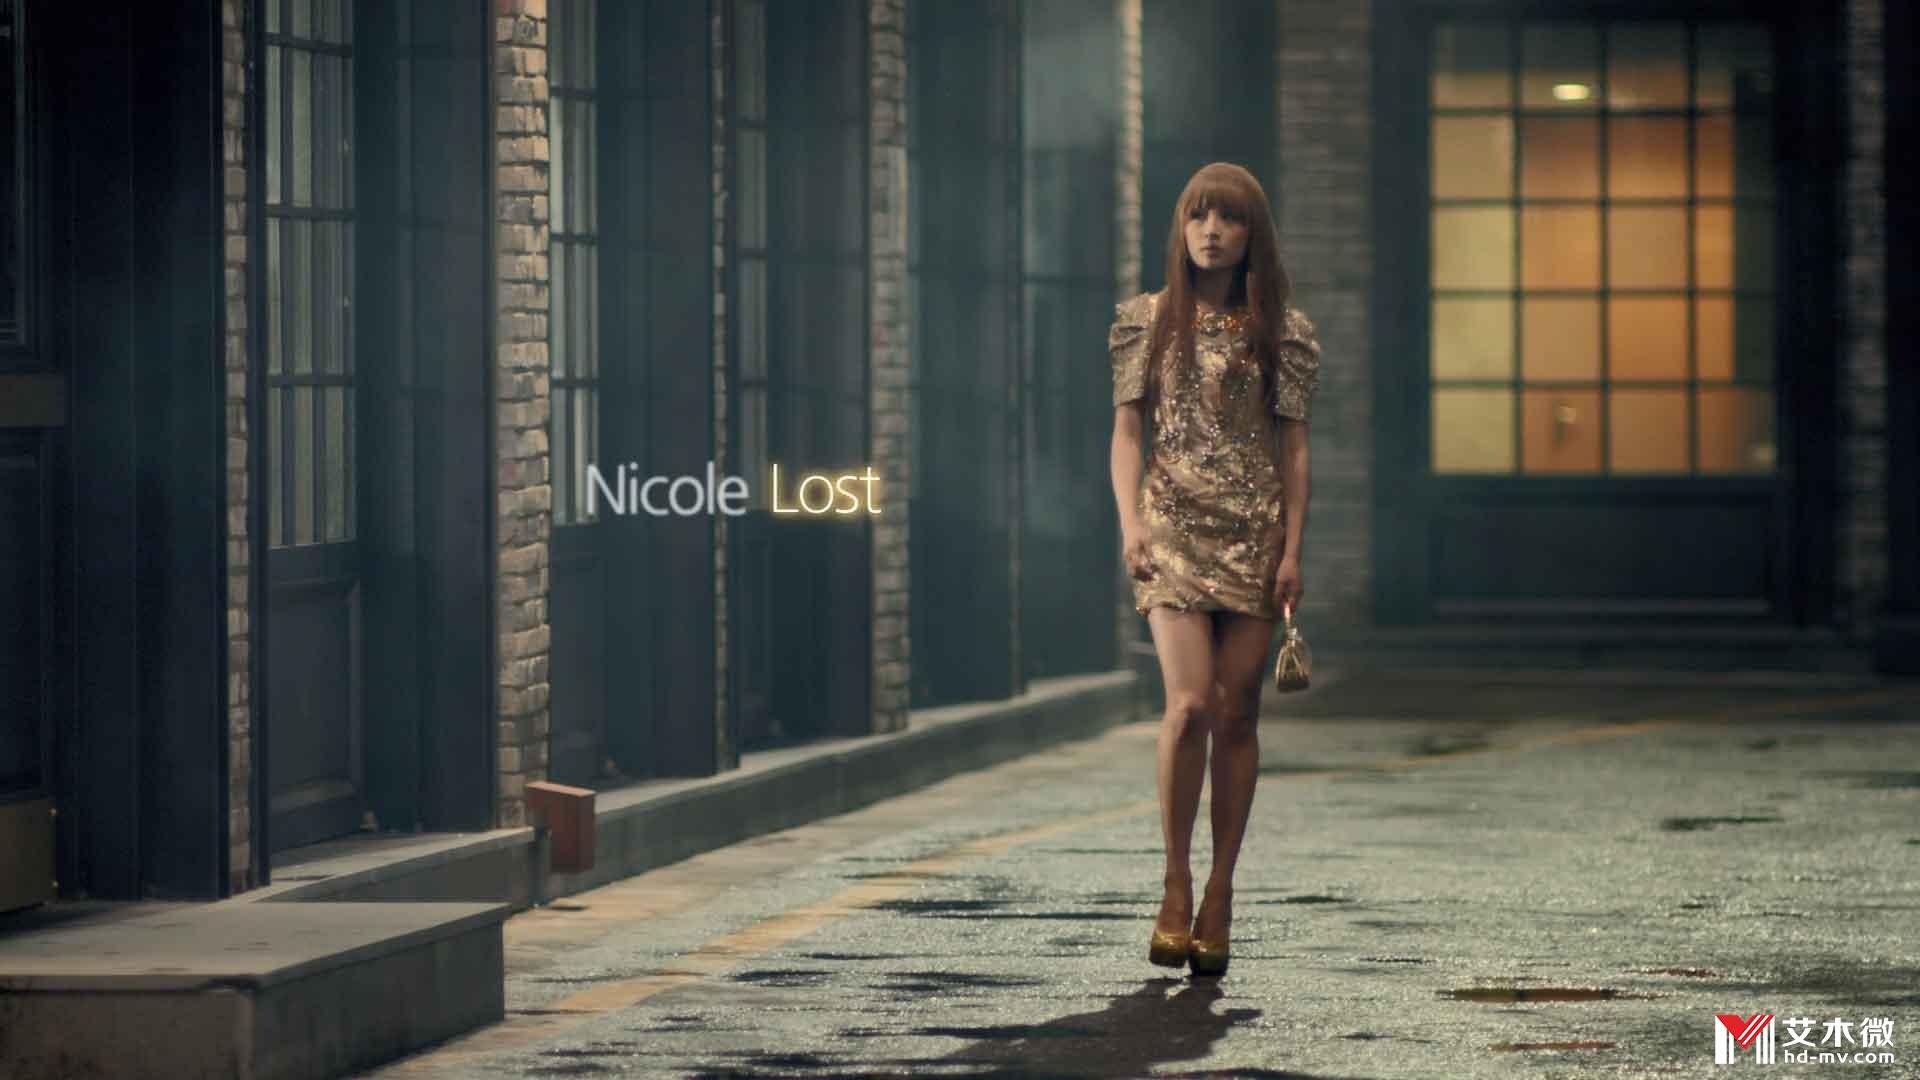 [1080P] Nicole(Kara) - Lost(feat Jinwoon of 2AM) (M2TS - 1.07G)